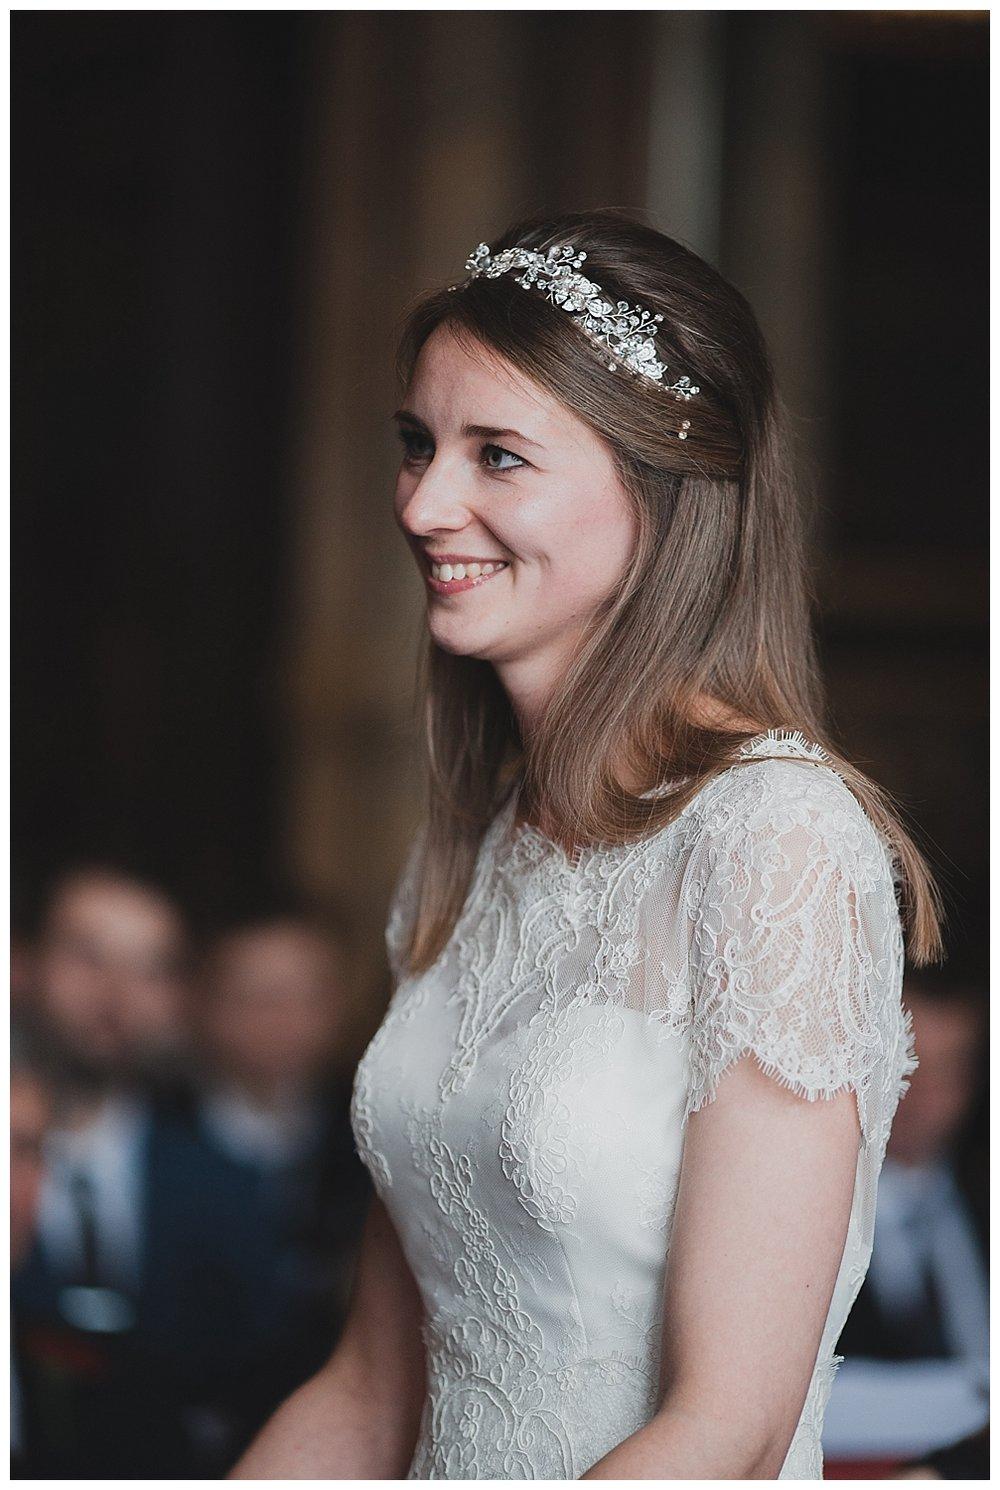 Bride in lace and a diamante tiara.